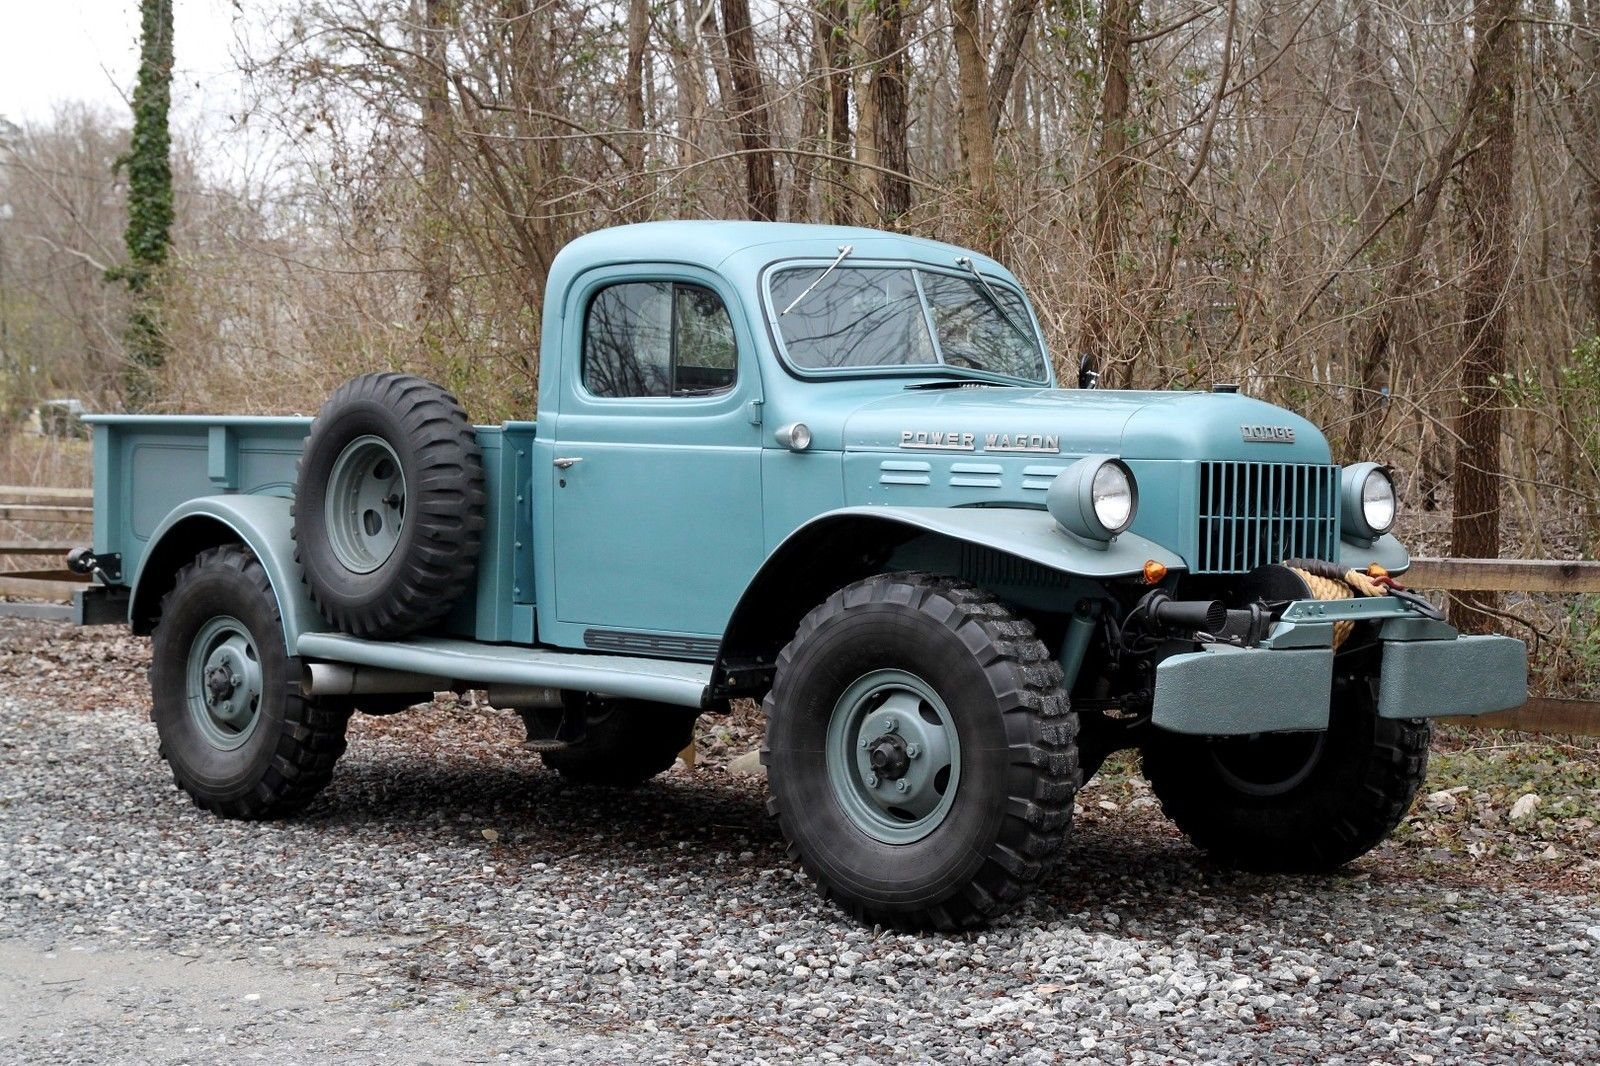 Dodge : Power Wagon Power Wagon | Dodge trucks, Cars and 4x4